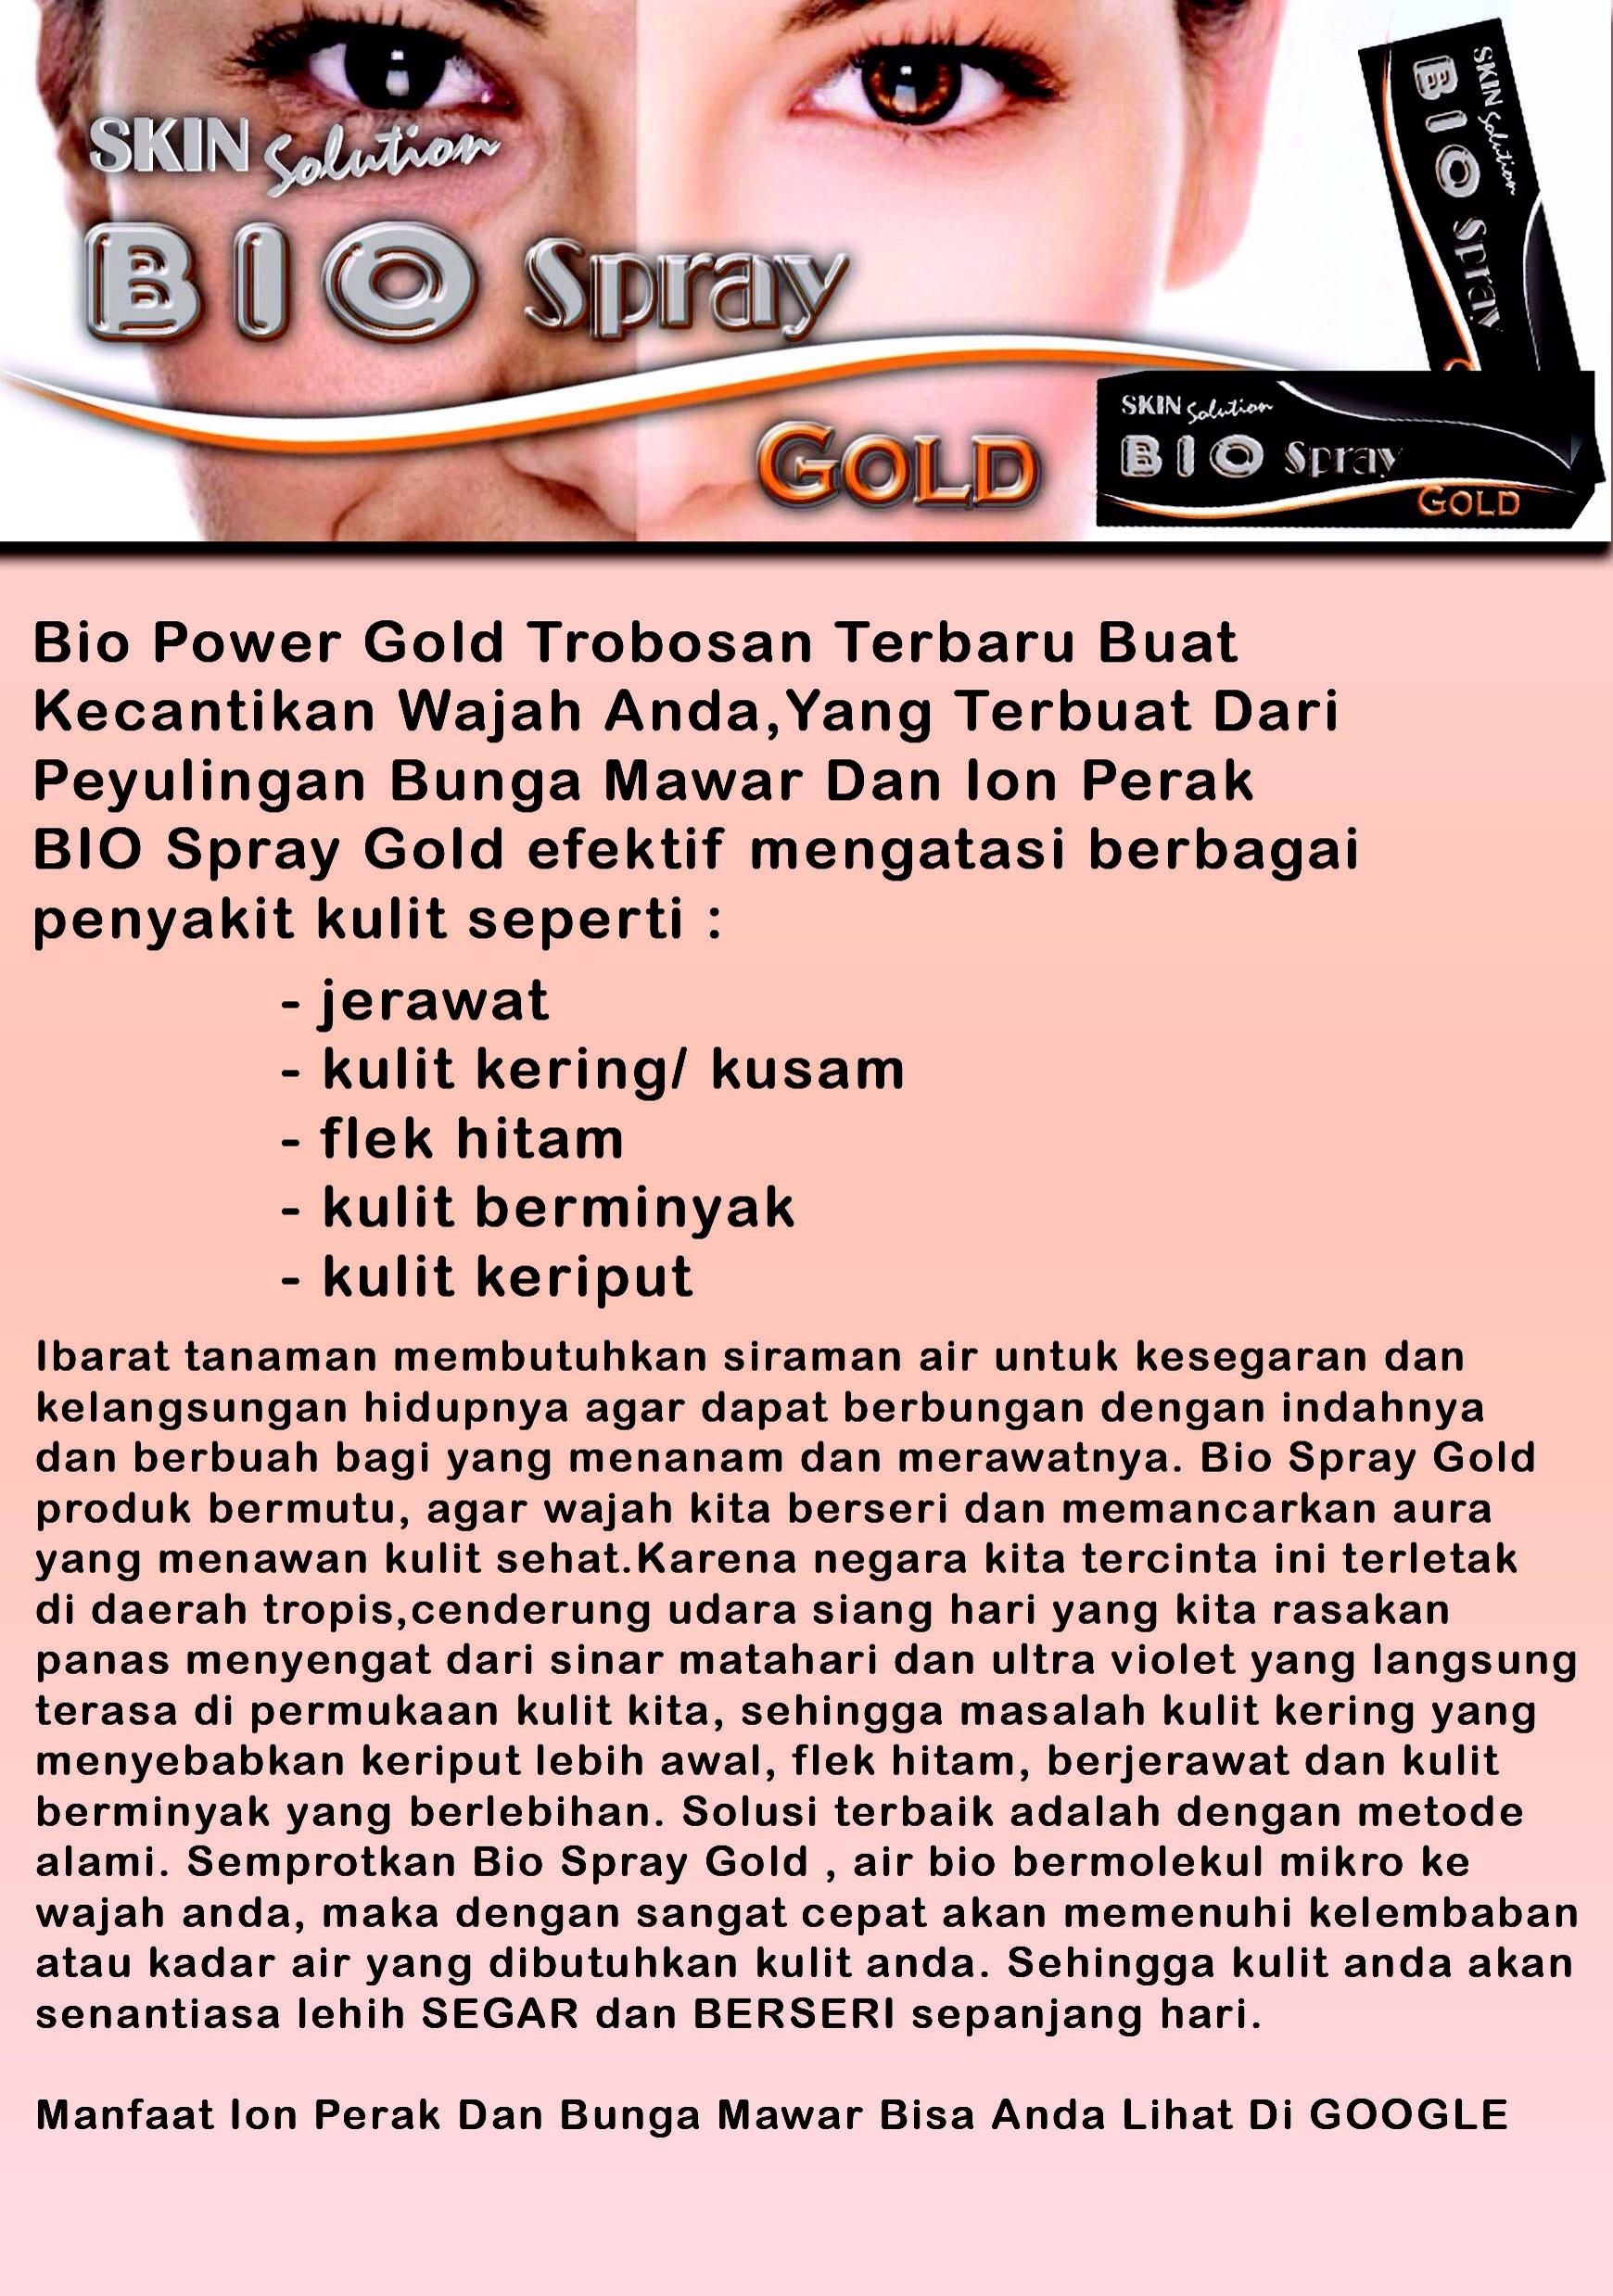 Produk Bio Spray Gold Msi Biospray Makassar